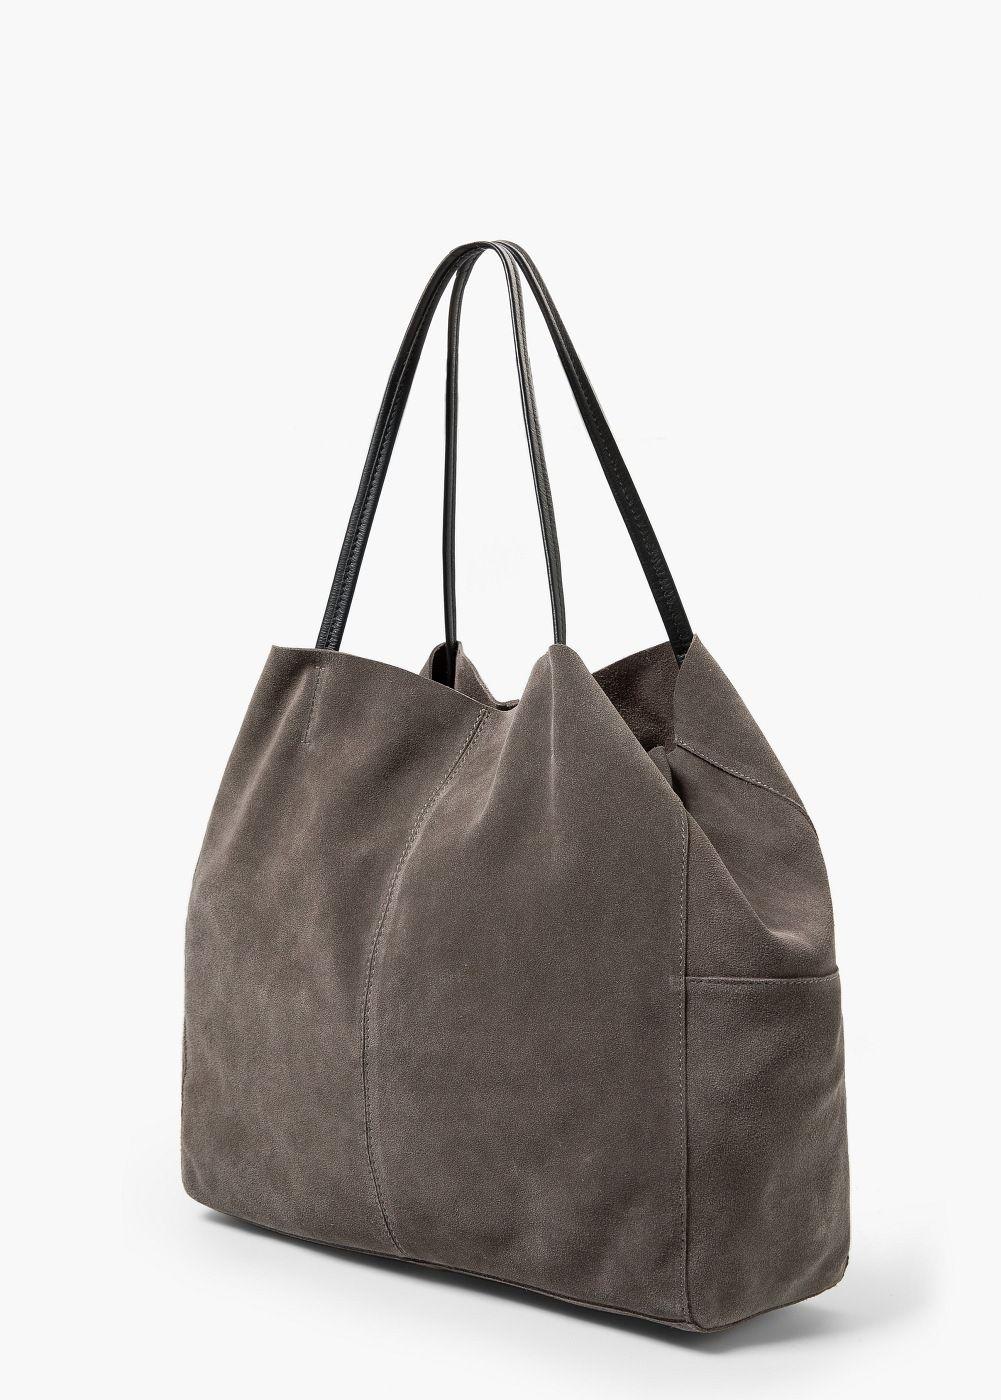 3a051999c789 Замшевая сумка шоппер - Женская in 2019 | Soft Natural Muted Summer ...